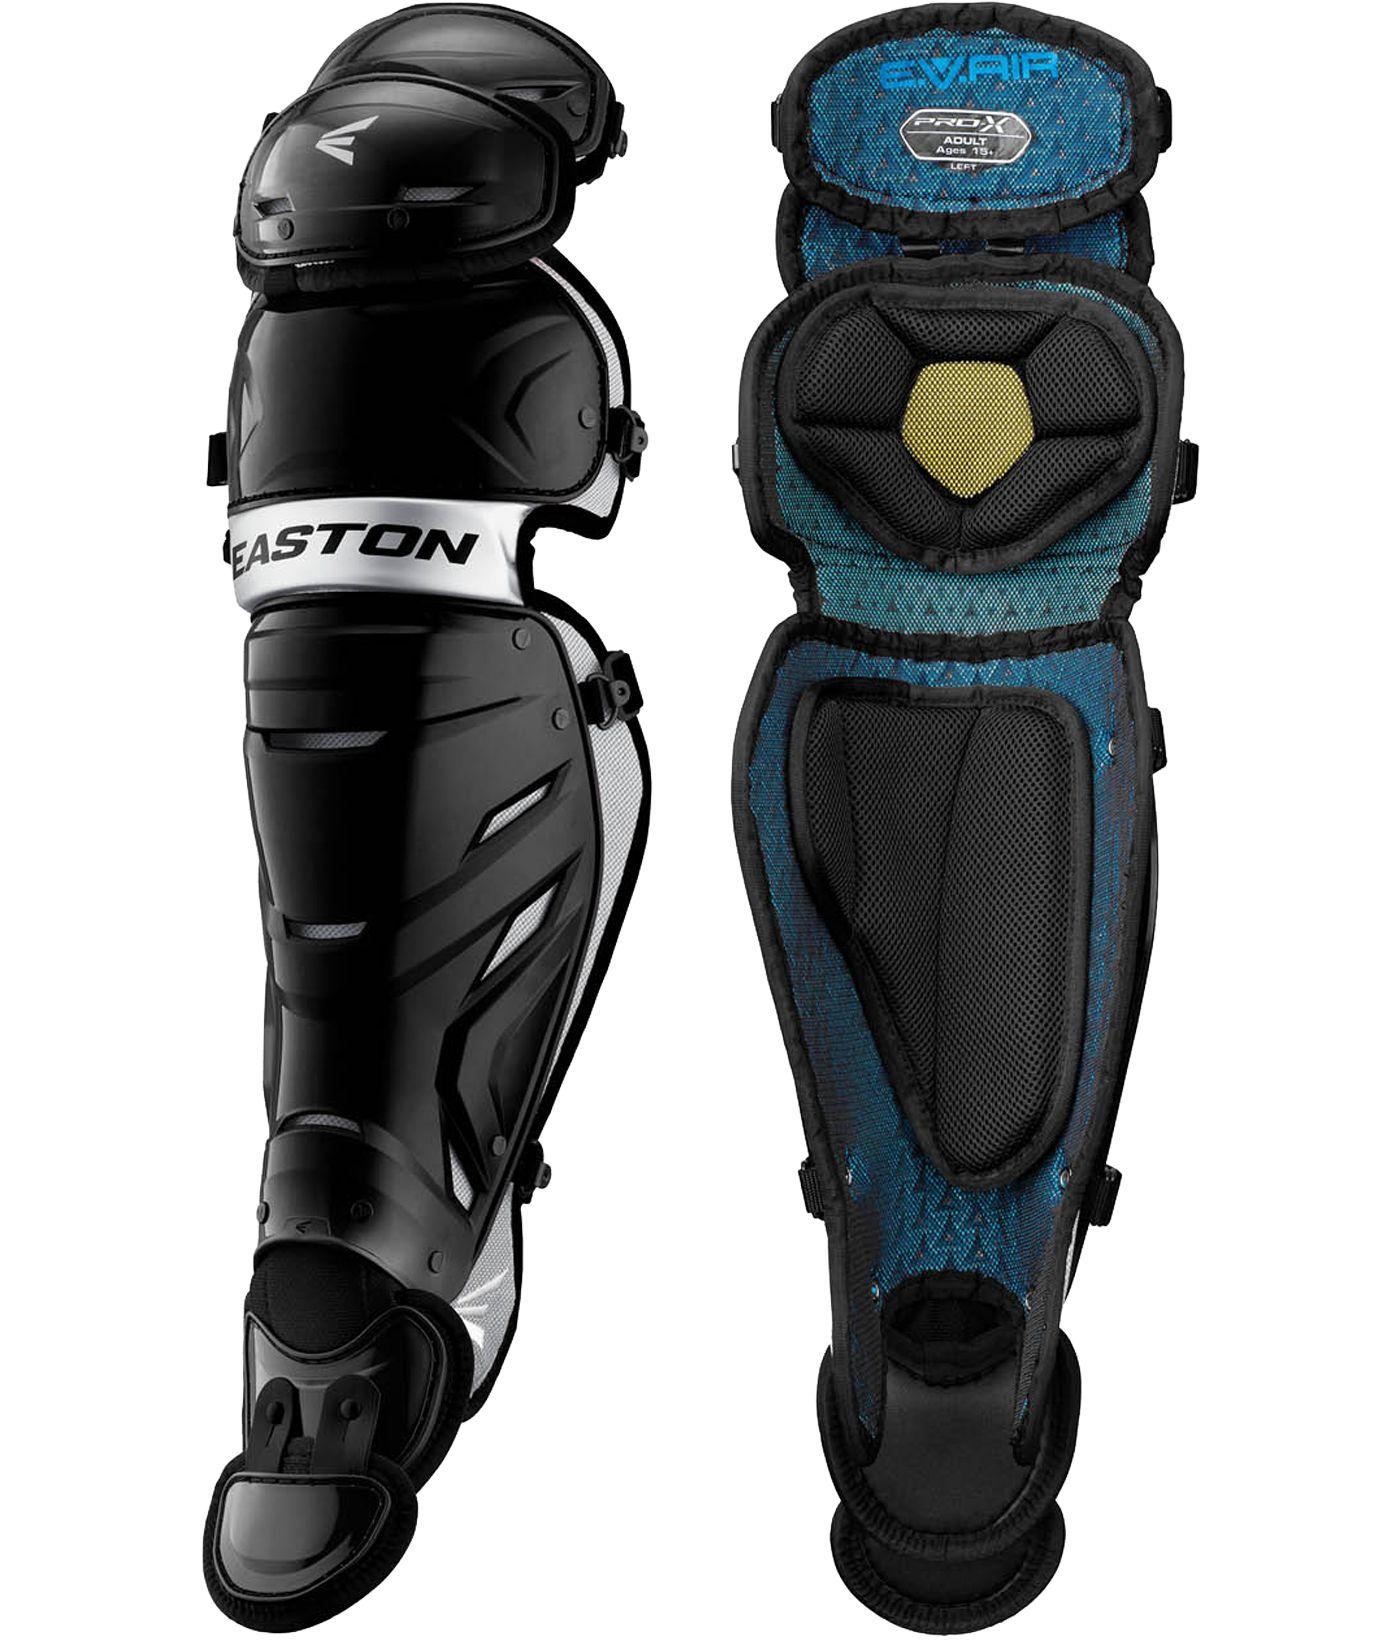 Easton Adult Pro X Leg Guards